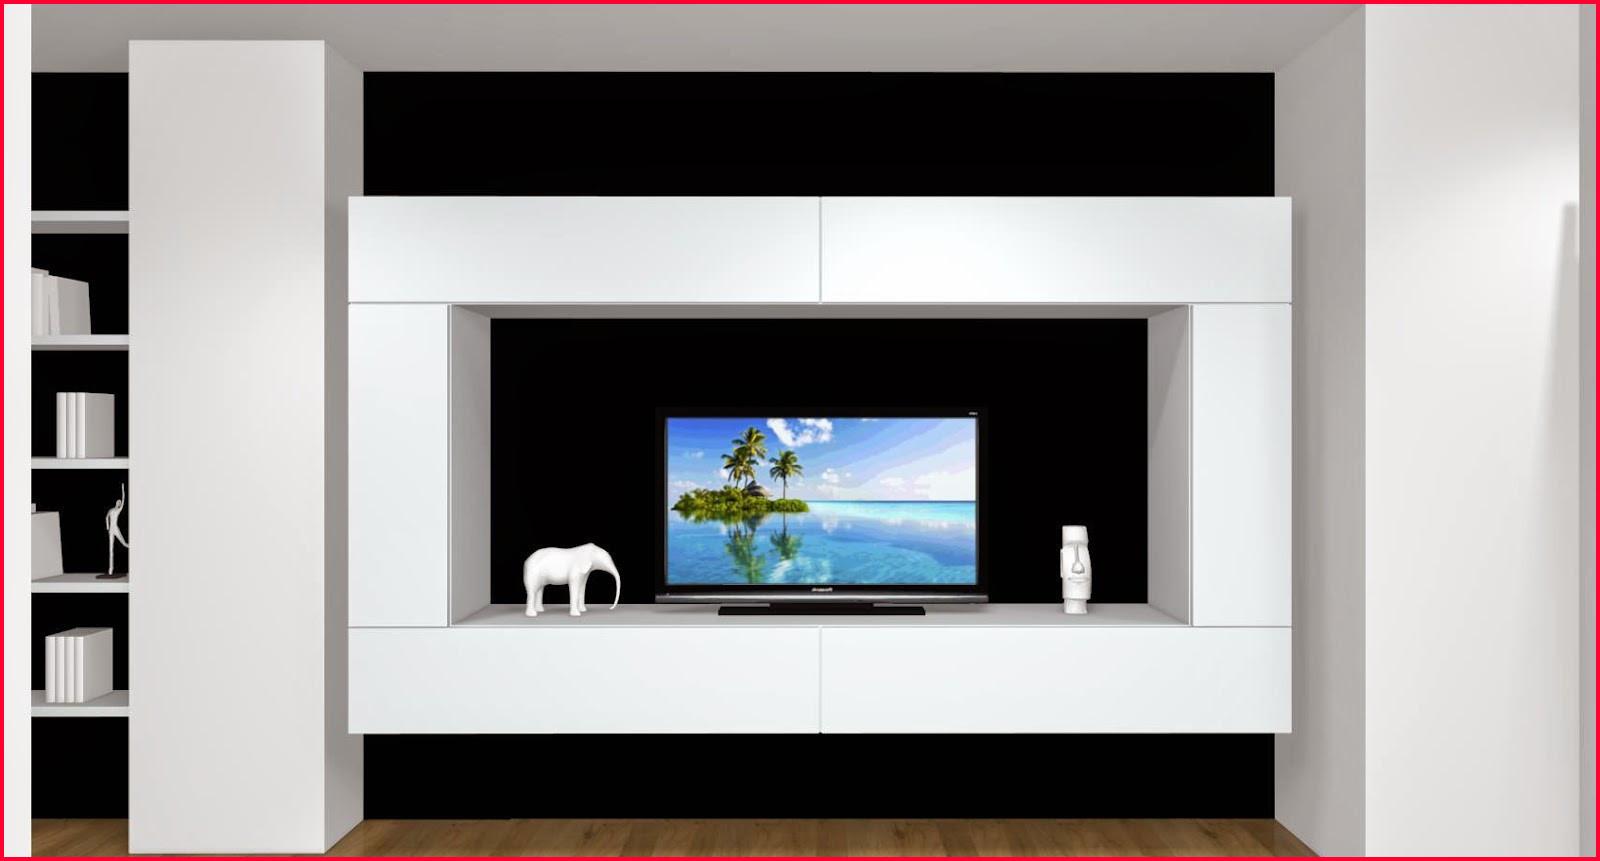 Diseño De Armarios X8d1 Mueble Diseà O Hermoso Muebles De Salon Diseno Mueble Dise C3